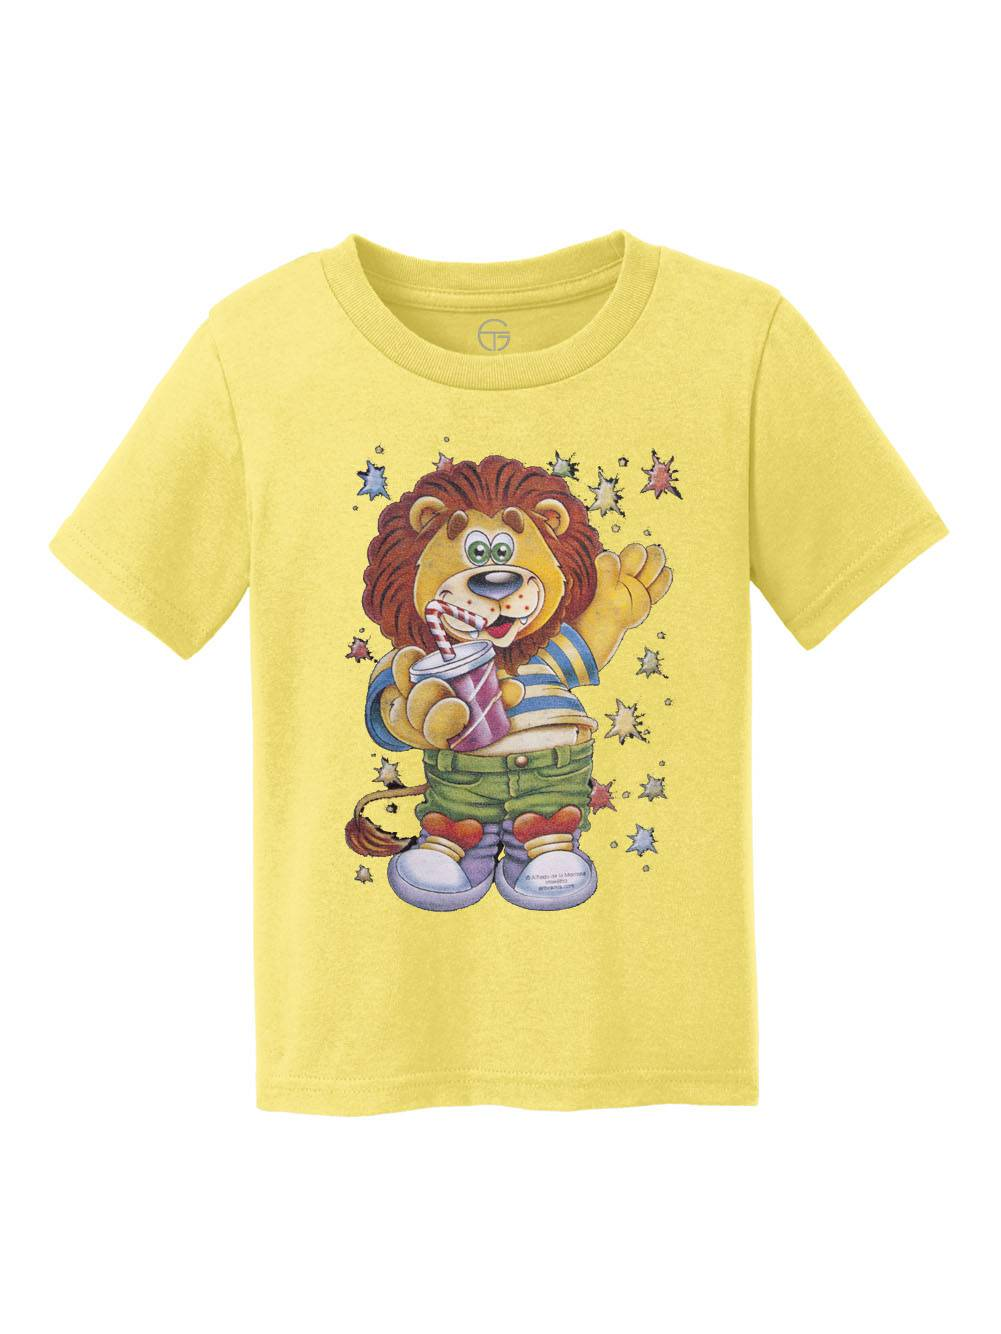 Lion Kid Youth Cotton T-Shirt